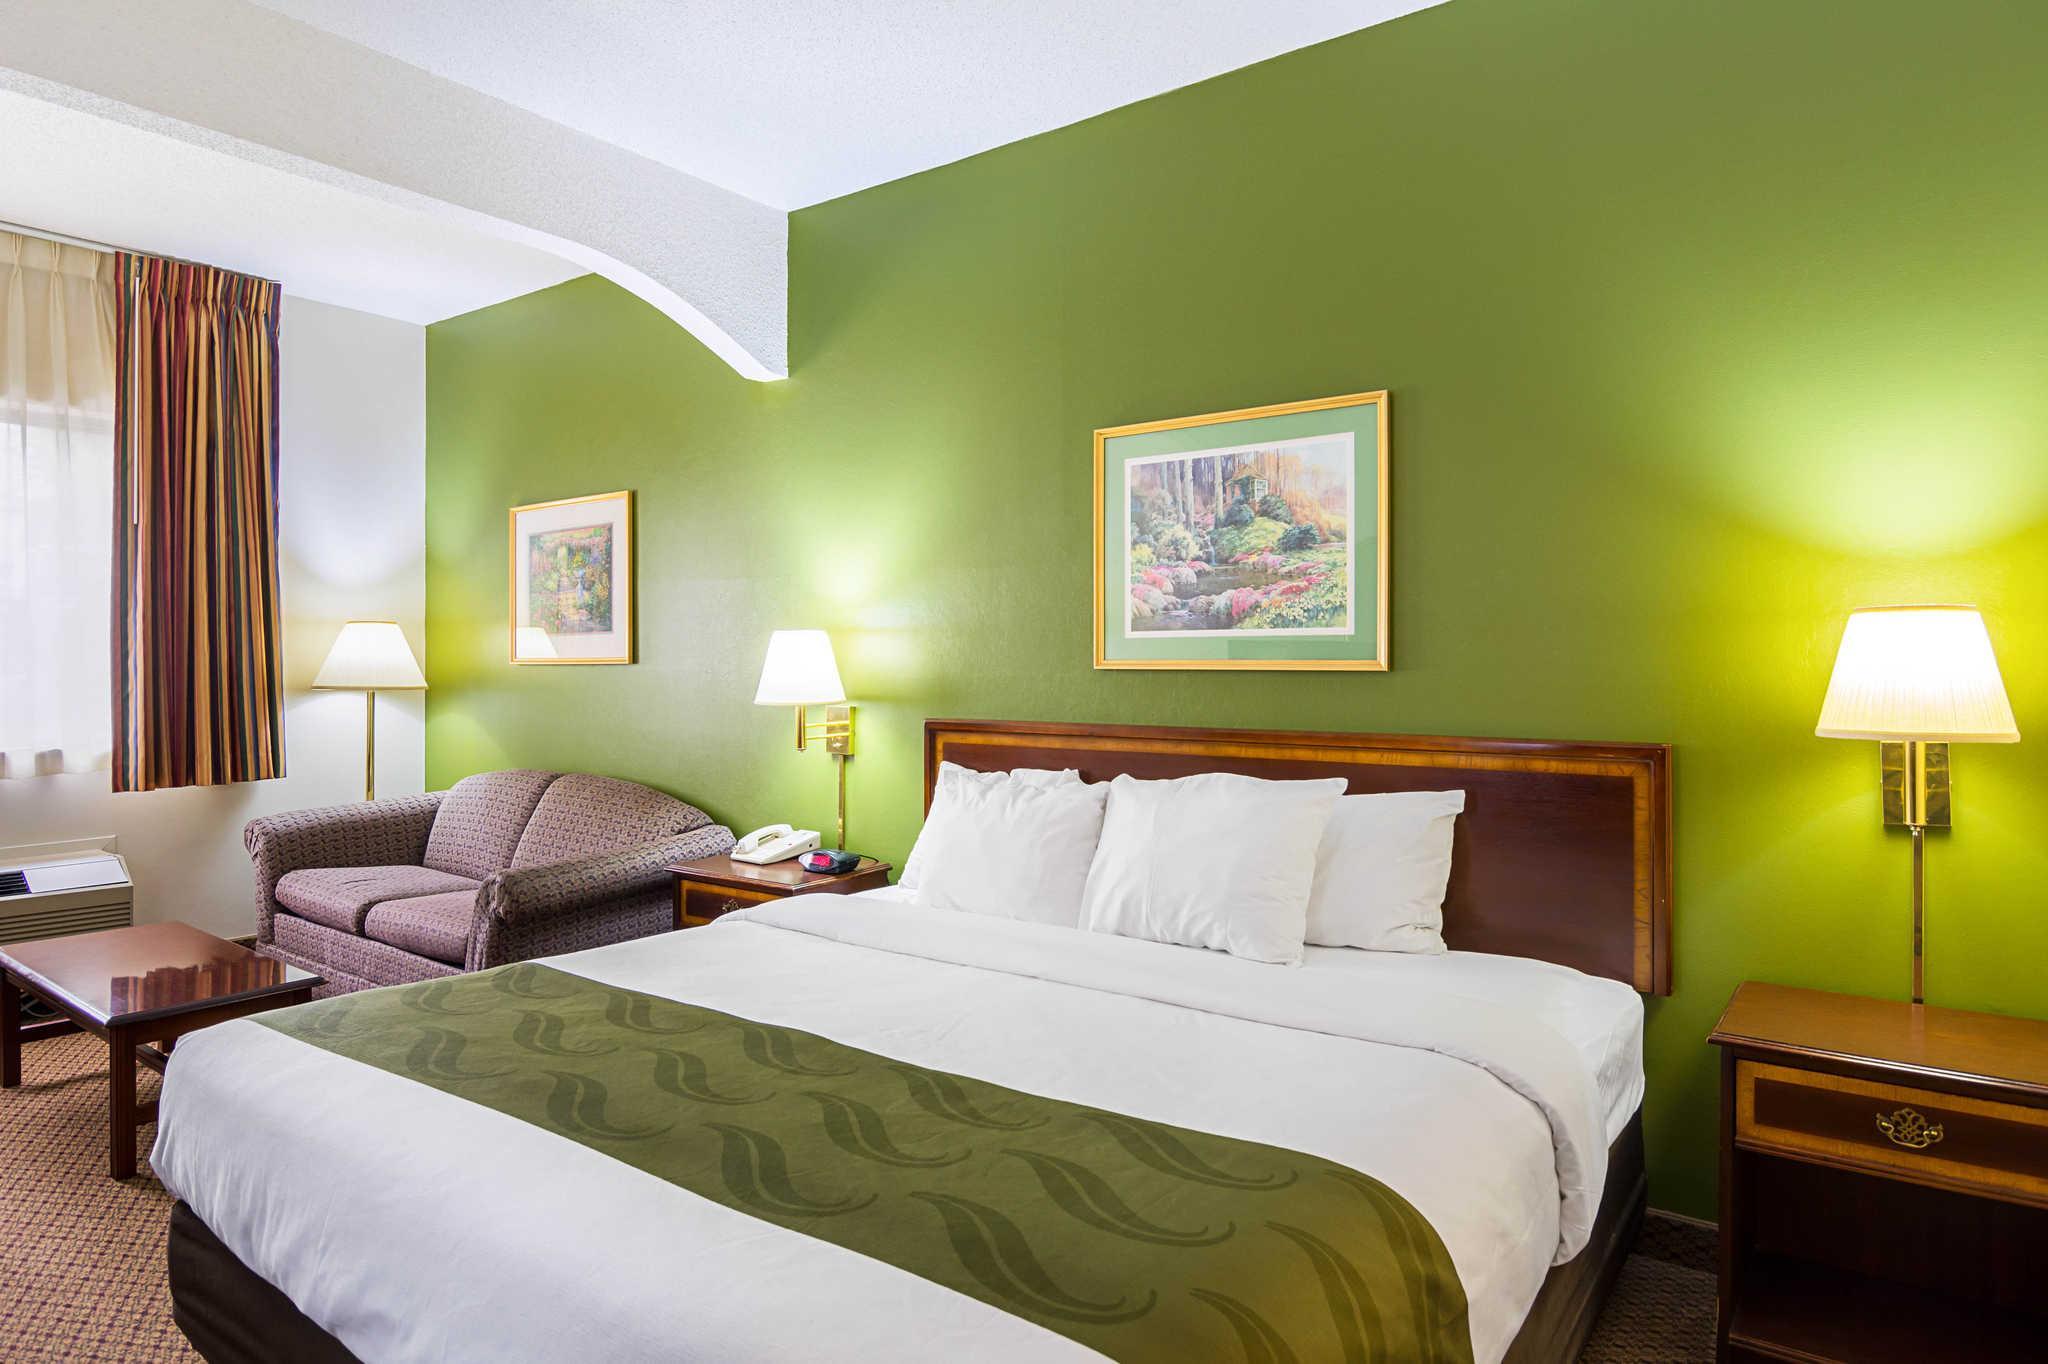 Quality Inn and Suites Kearneysville - Martinsburg, Berkeley